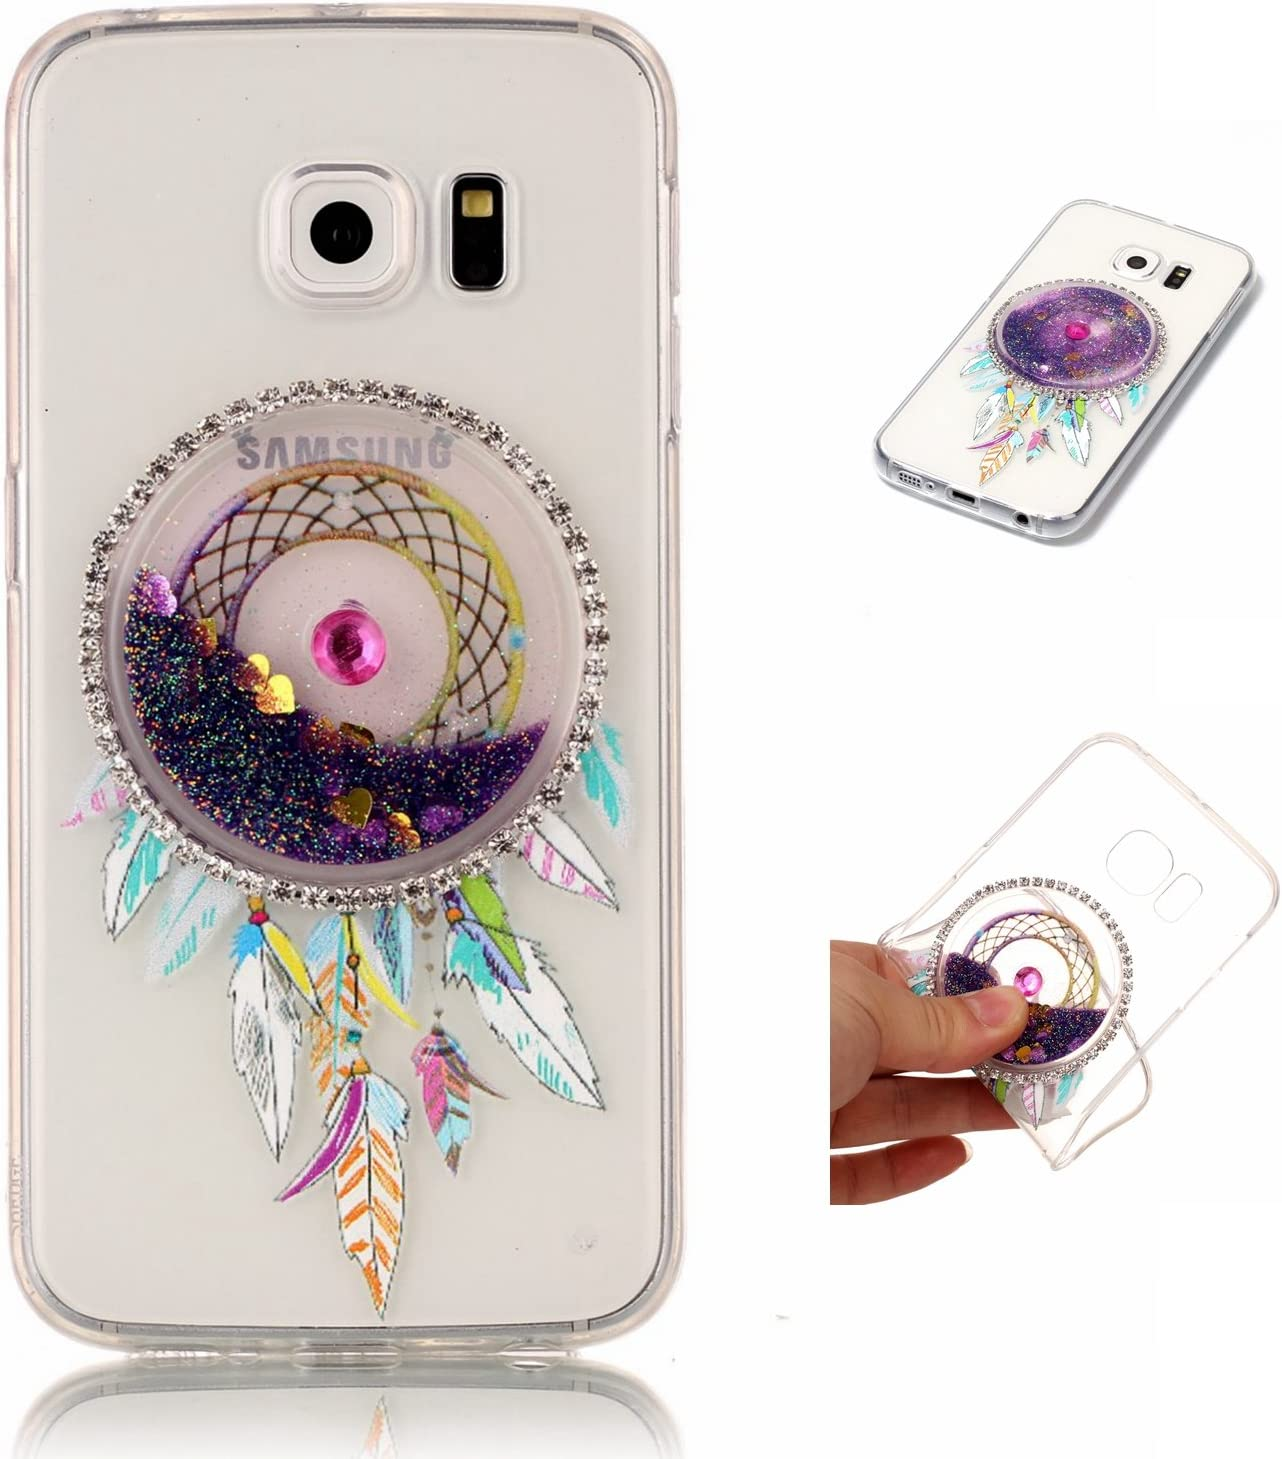 Samsung A3 2017 Hülle Spiritsun Glitter Liquid Elektronik